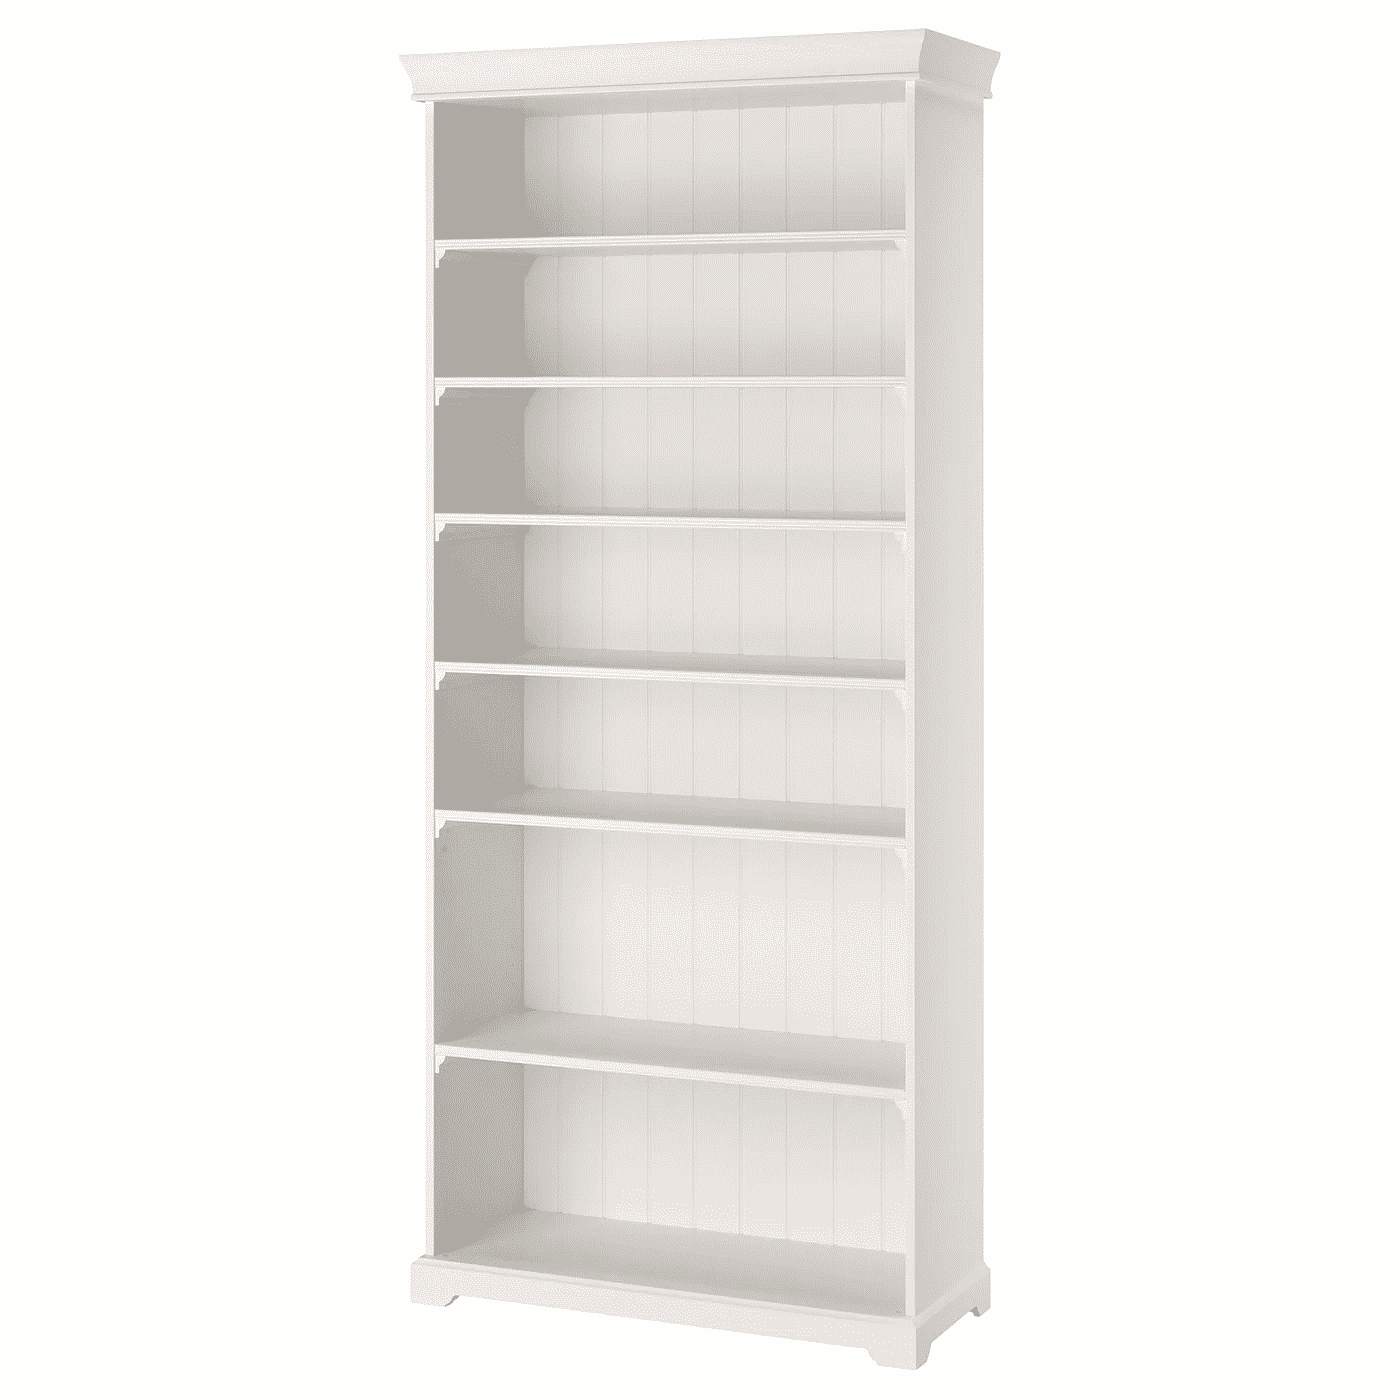 The LIATORP Bookshelf